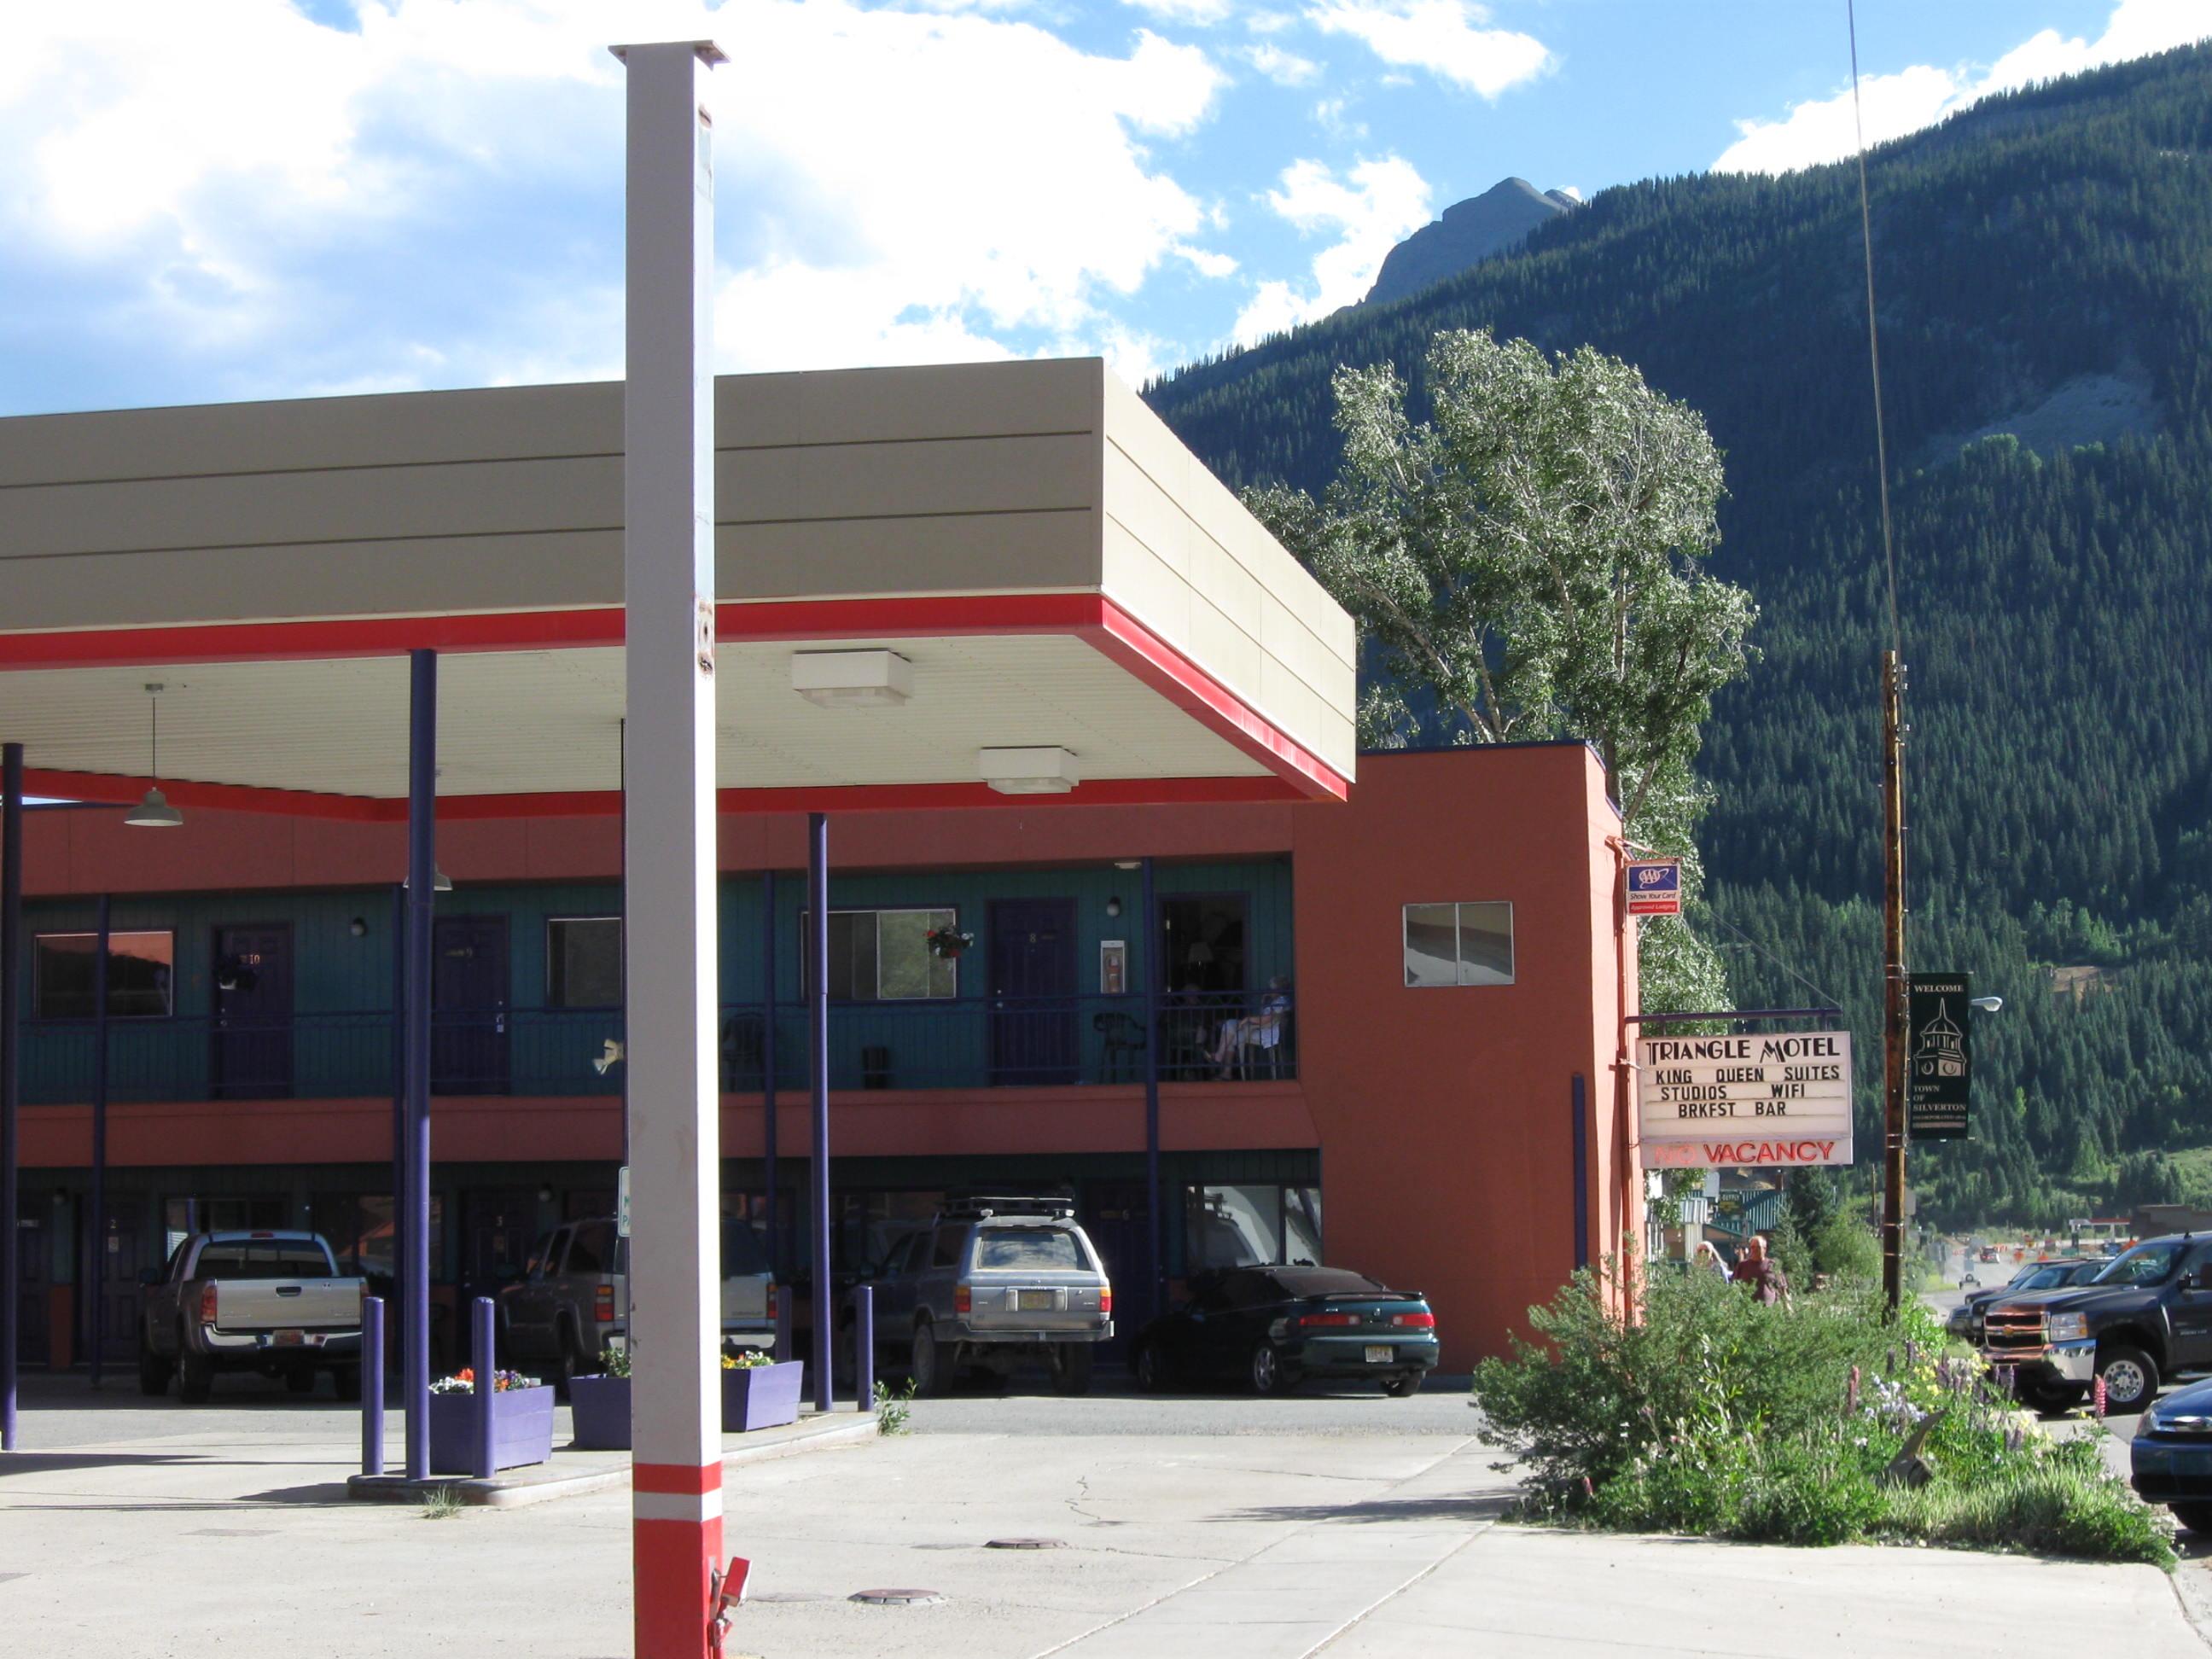 Triangle Motel